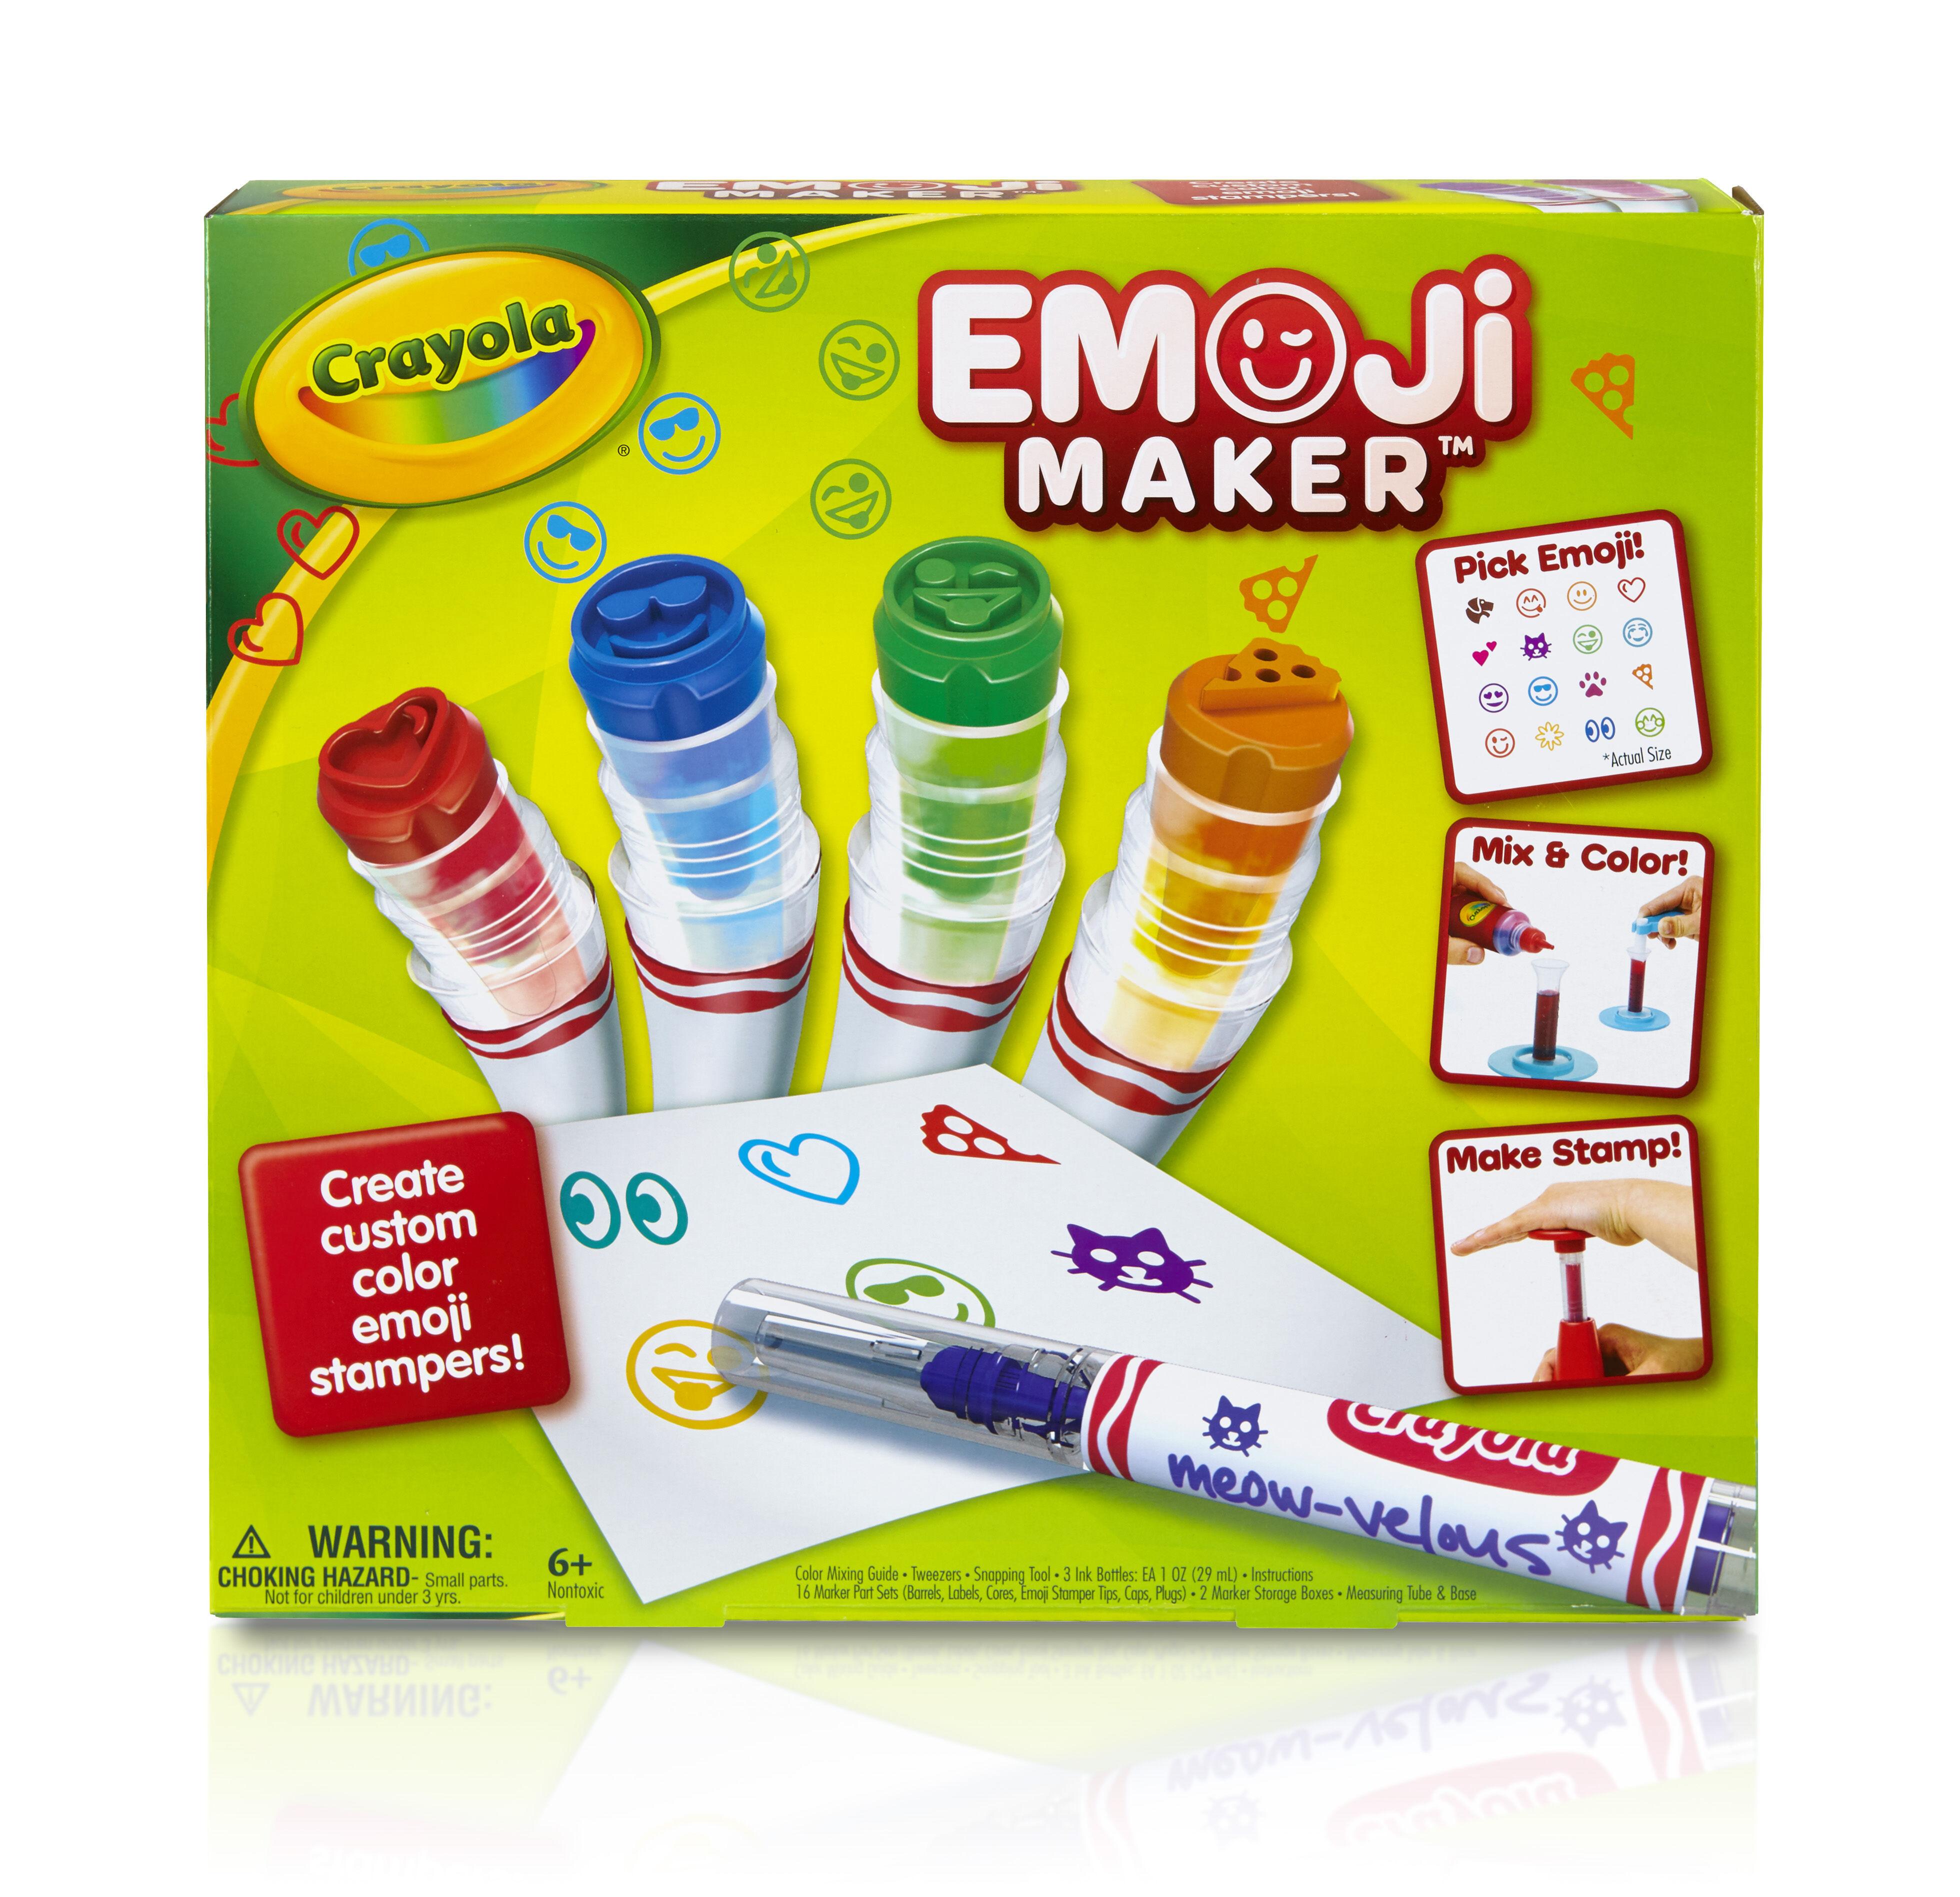 Emoji Marker Maker - Crayola